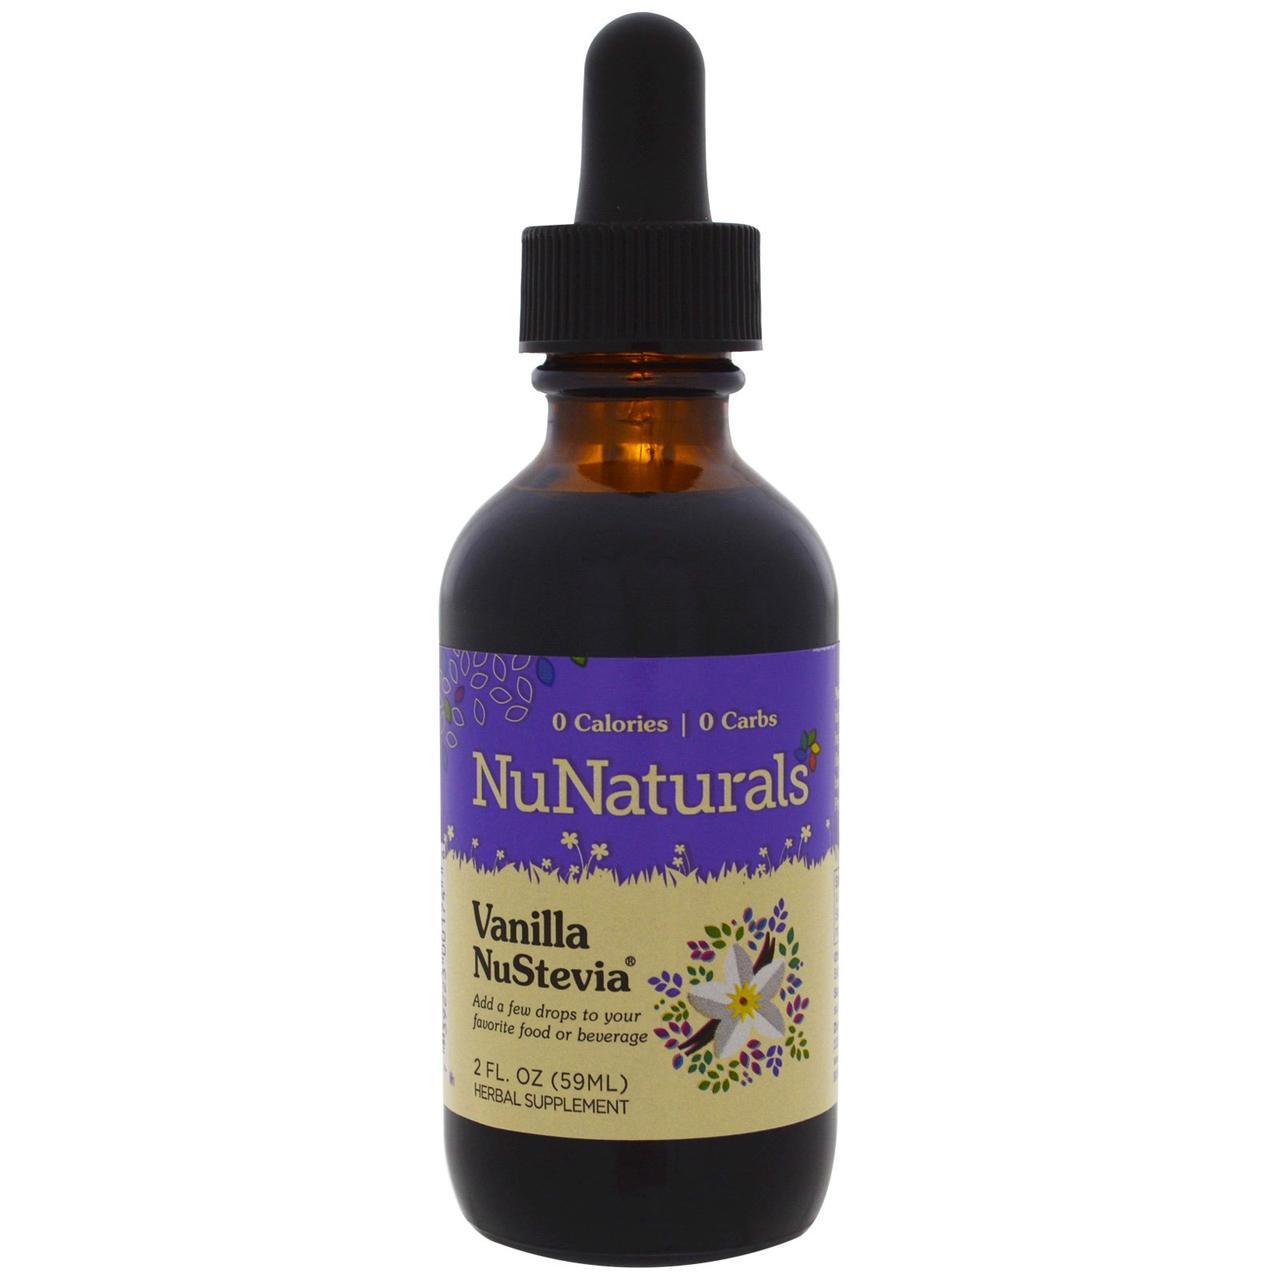 NuNaturals, Vanilla NuStevia, 59 мл (2 fl oz)